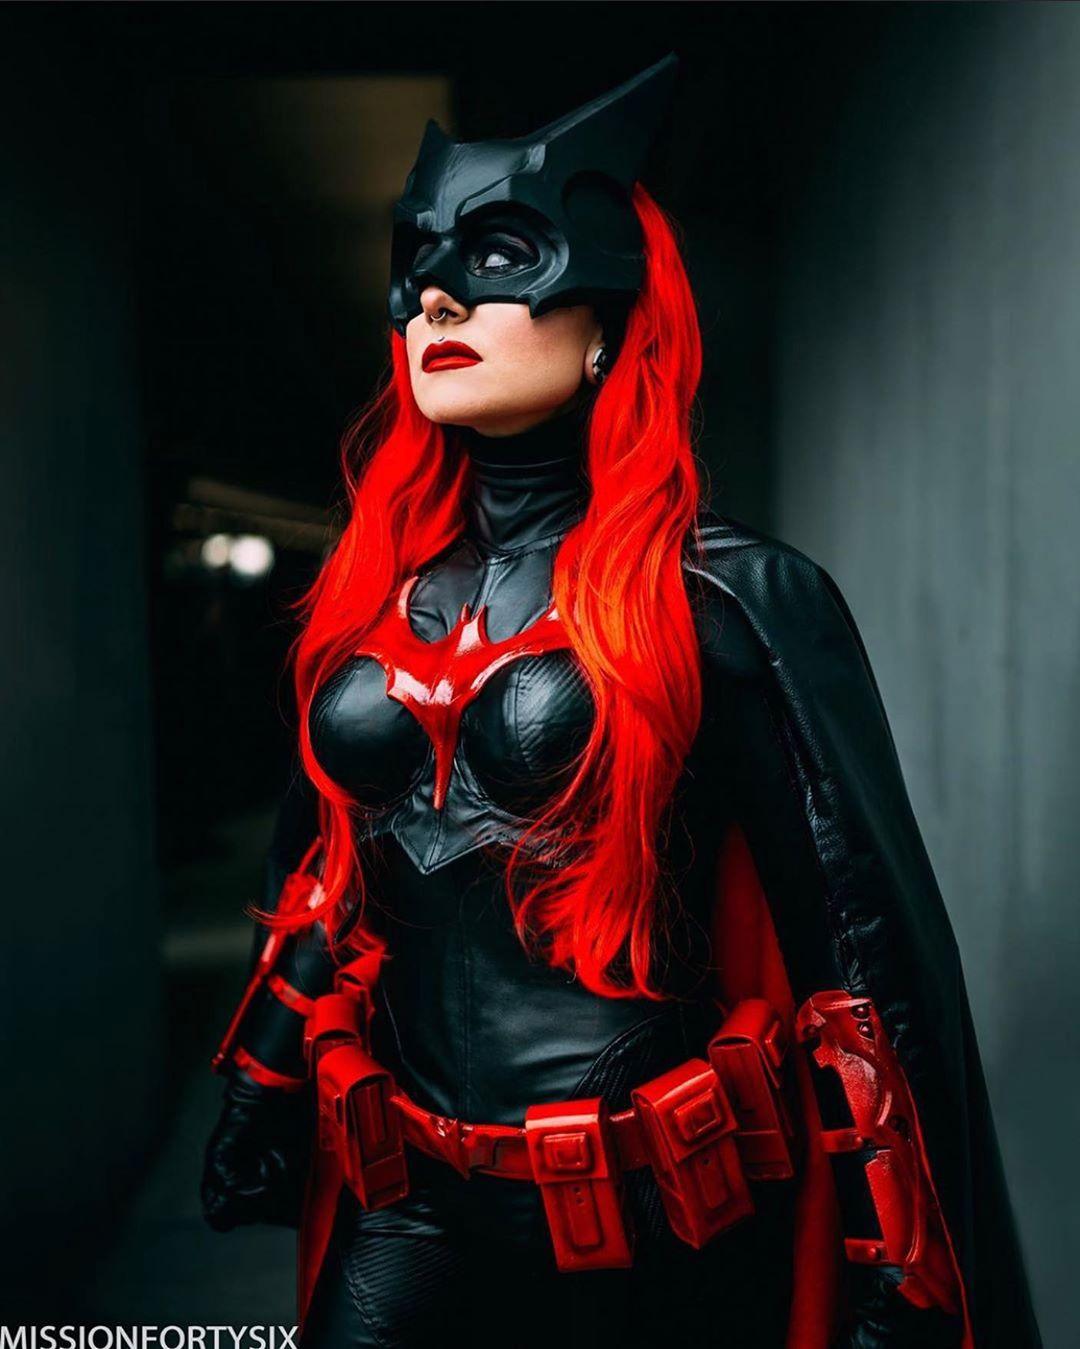 batwoman cosplay by kawaiimayhem photo by missionfortysix